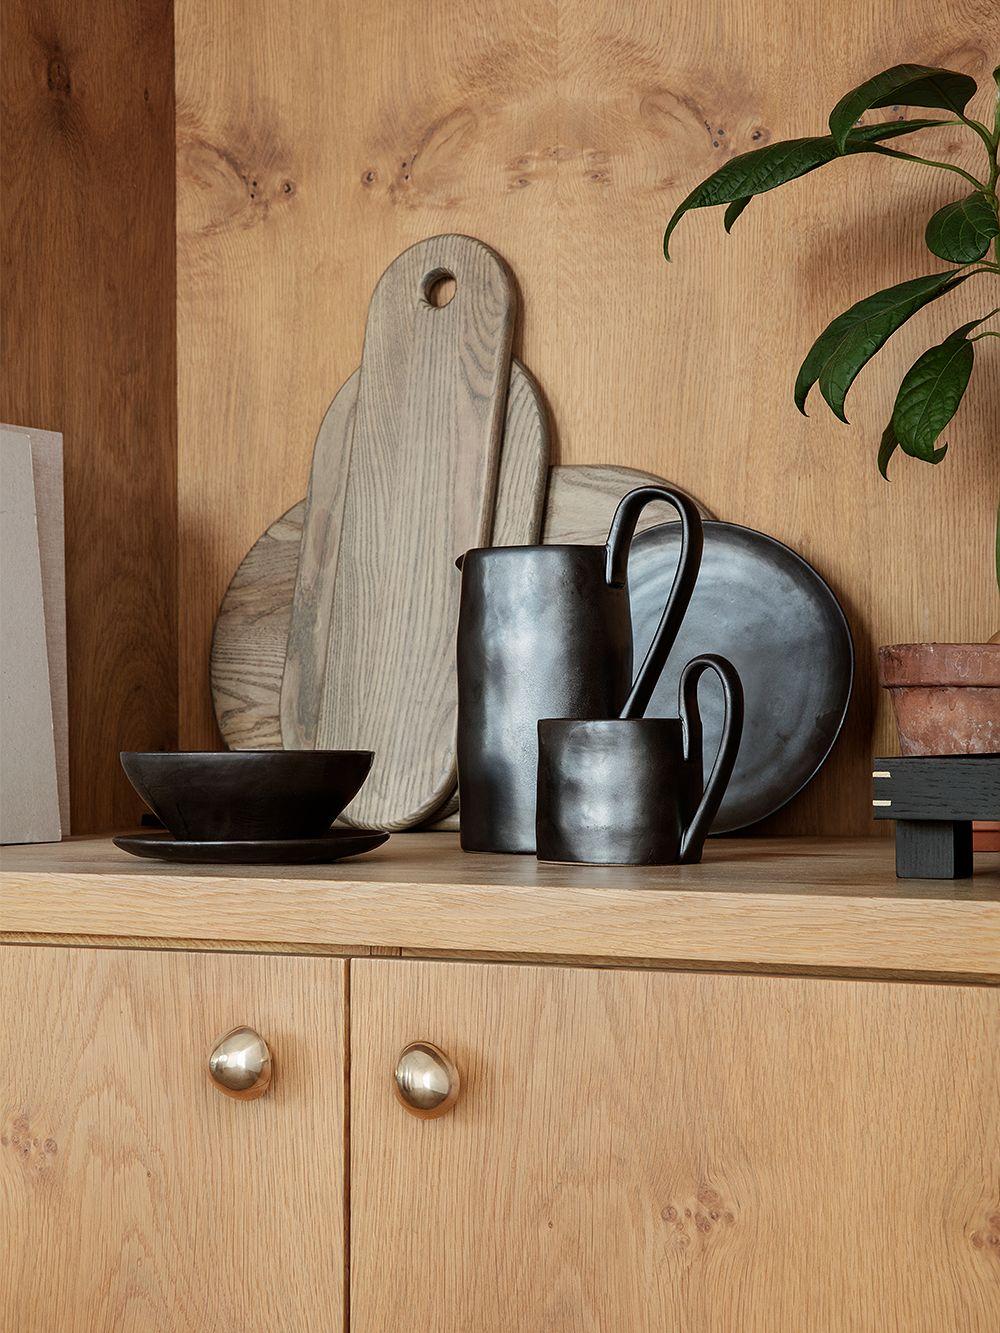 Ferm Living's Mushroom hooks as pulls on a cabinet.